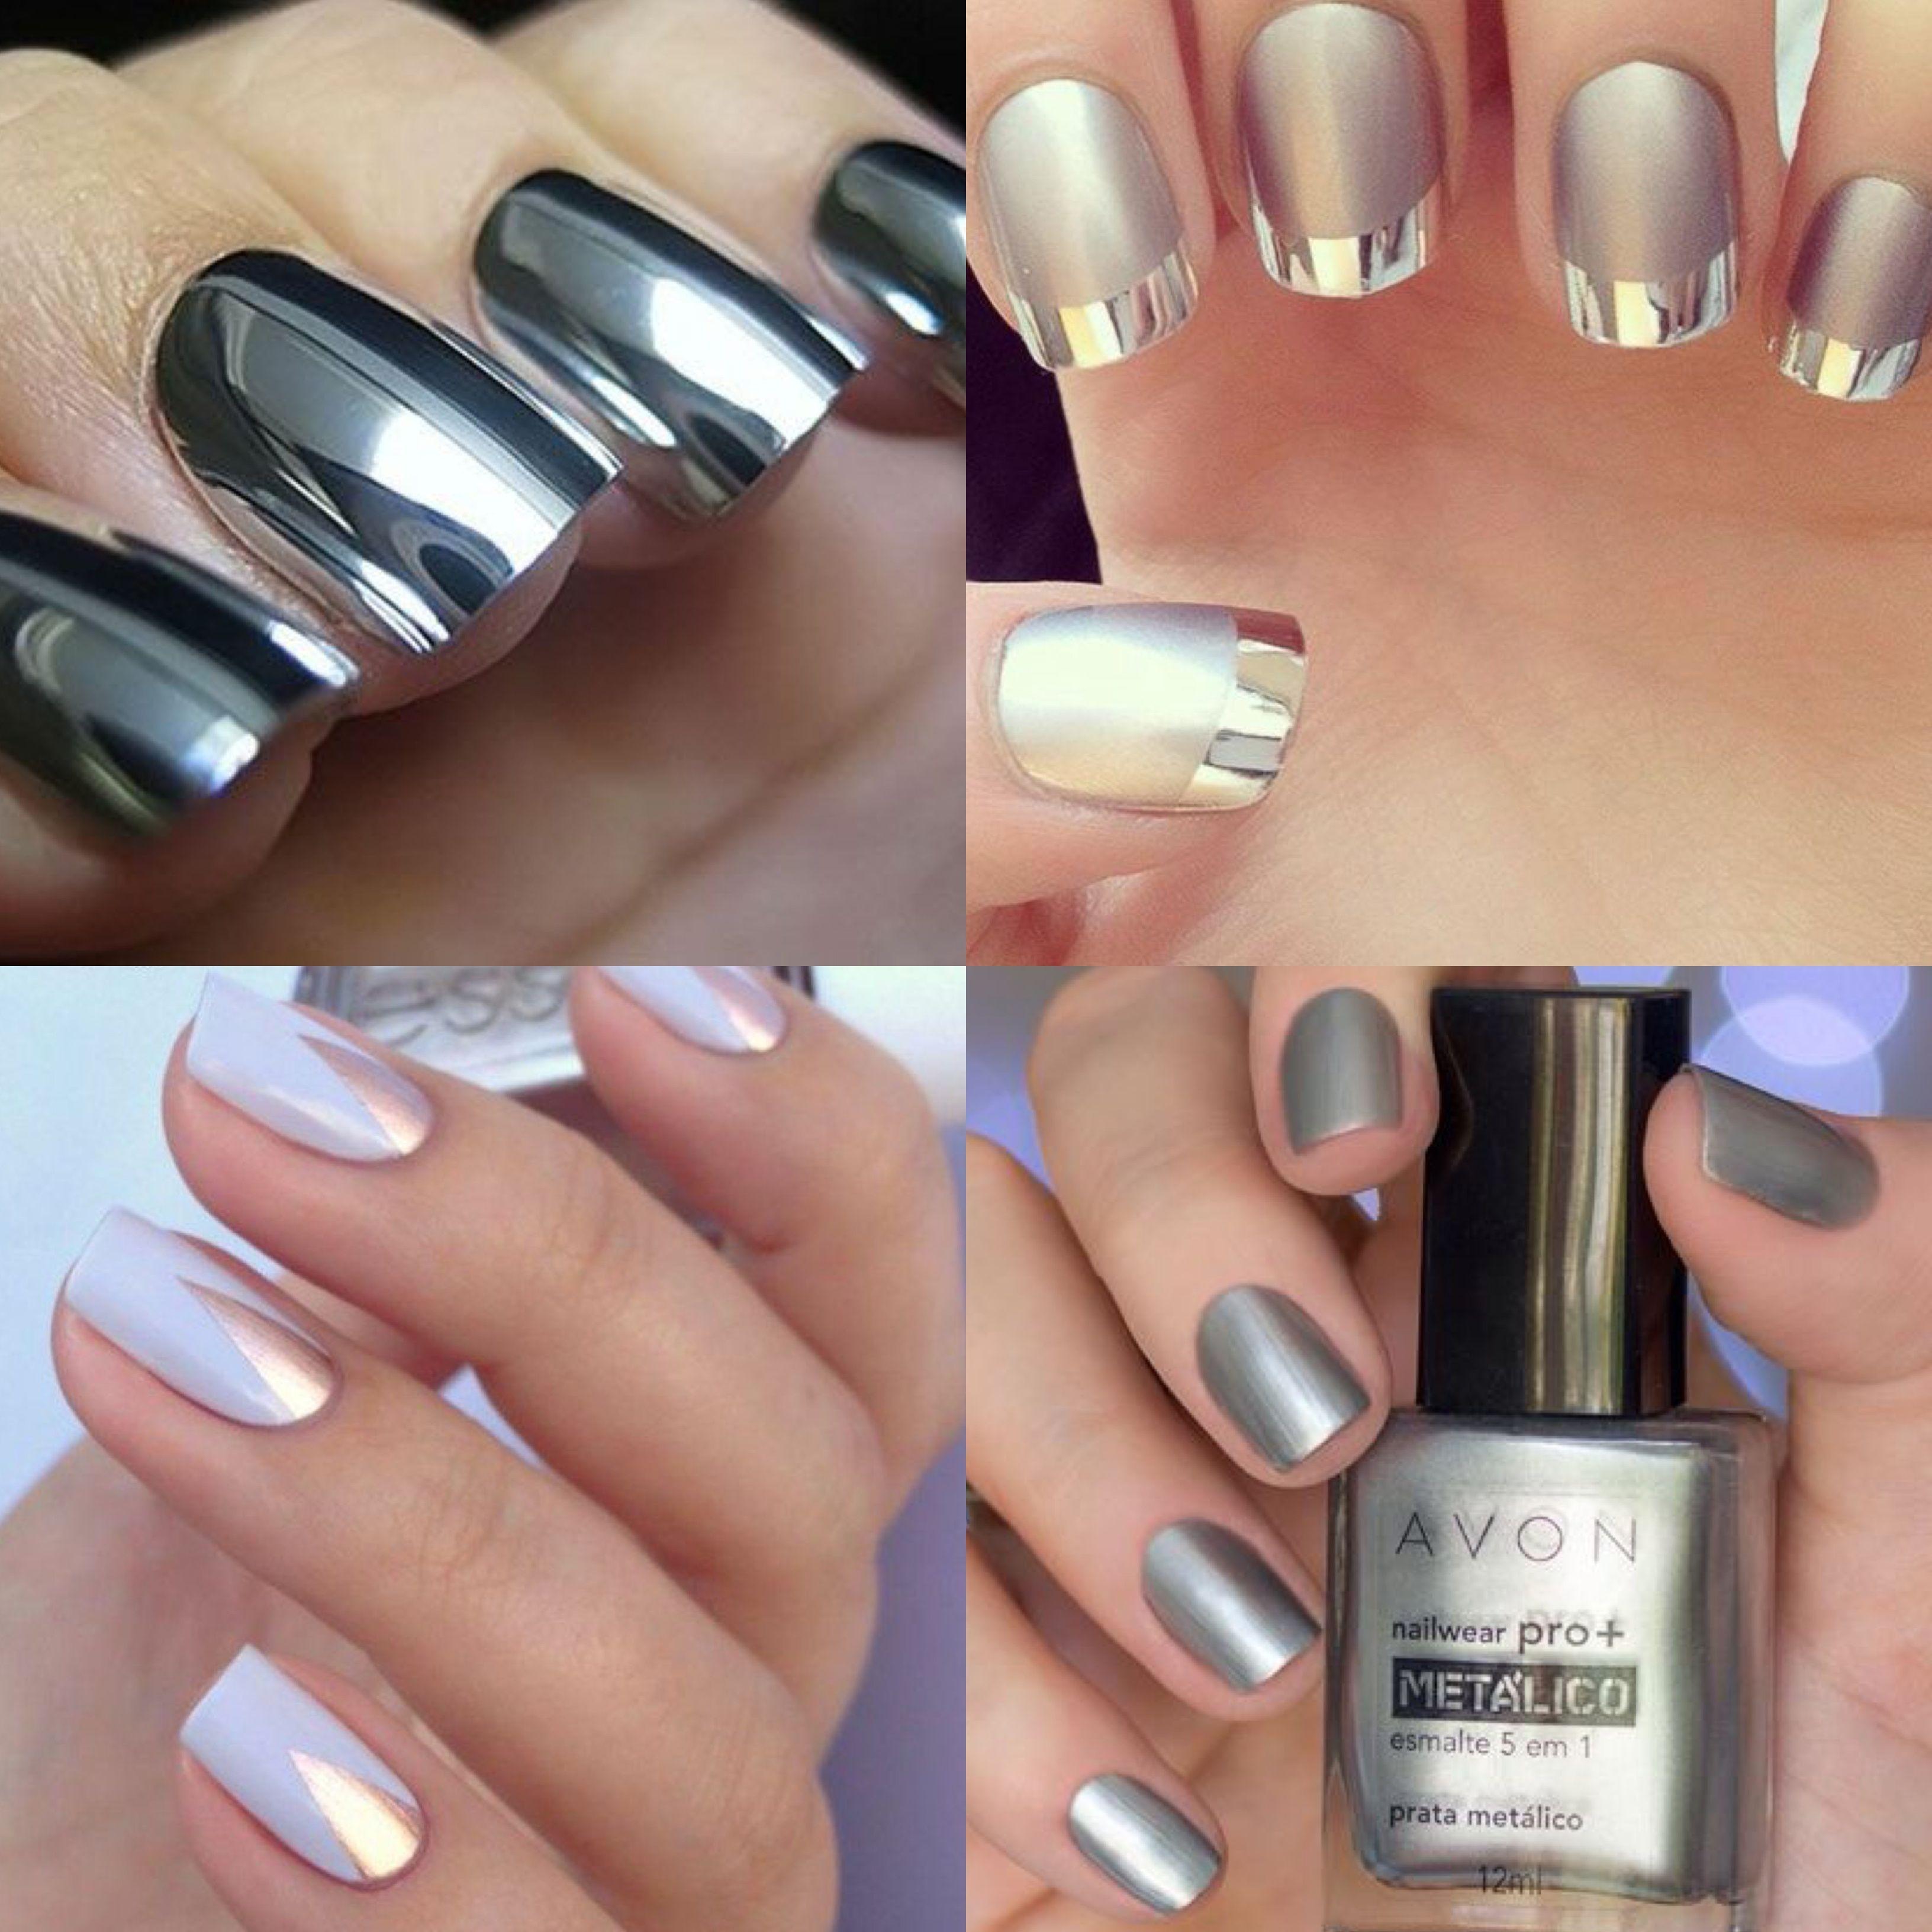 Tendência: Metalizados - tendência, metalizado, unha, esmalte, prata ...